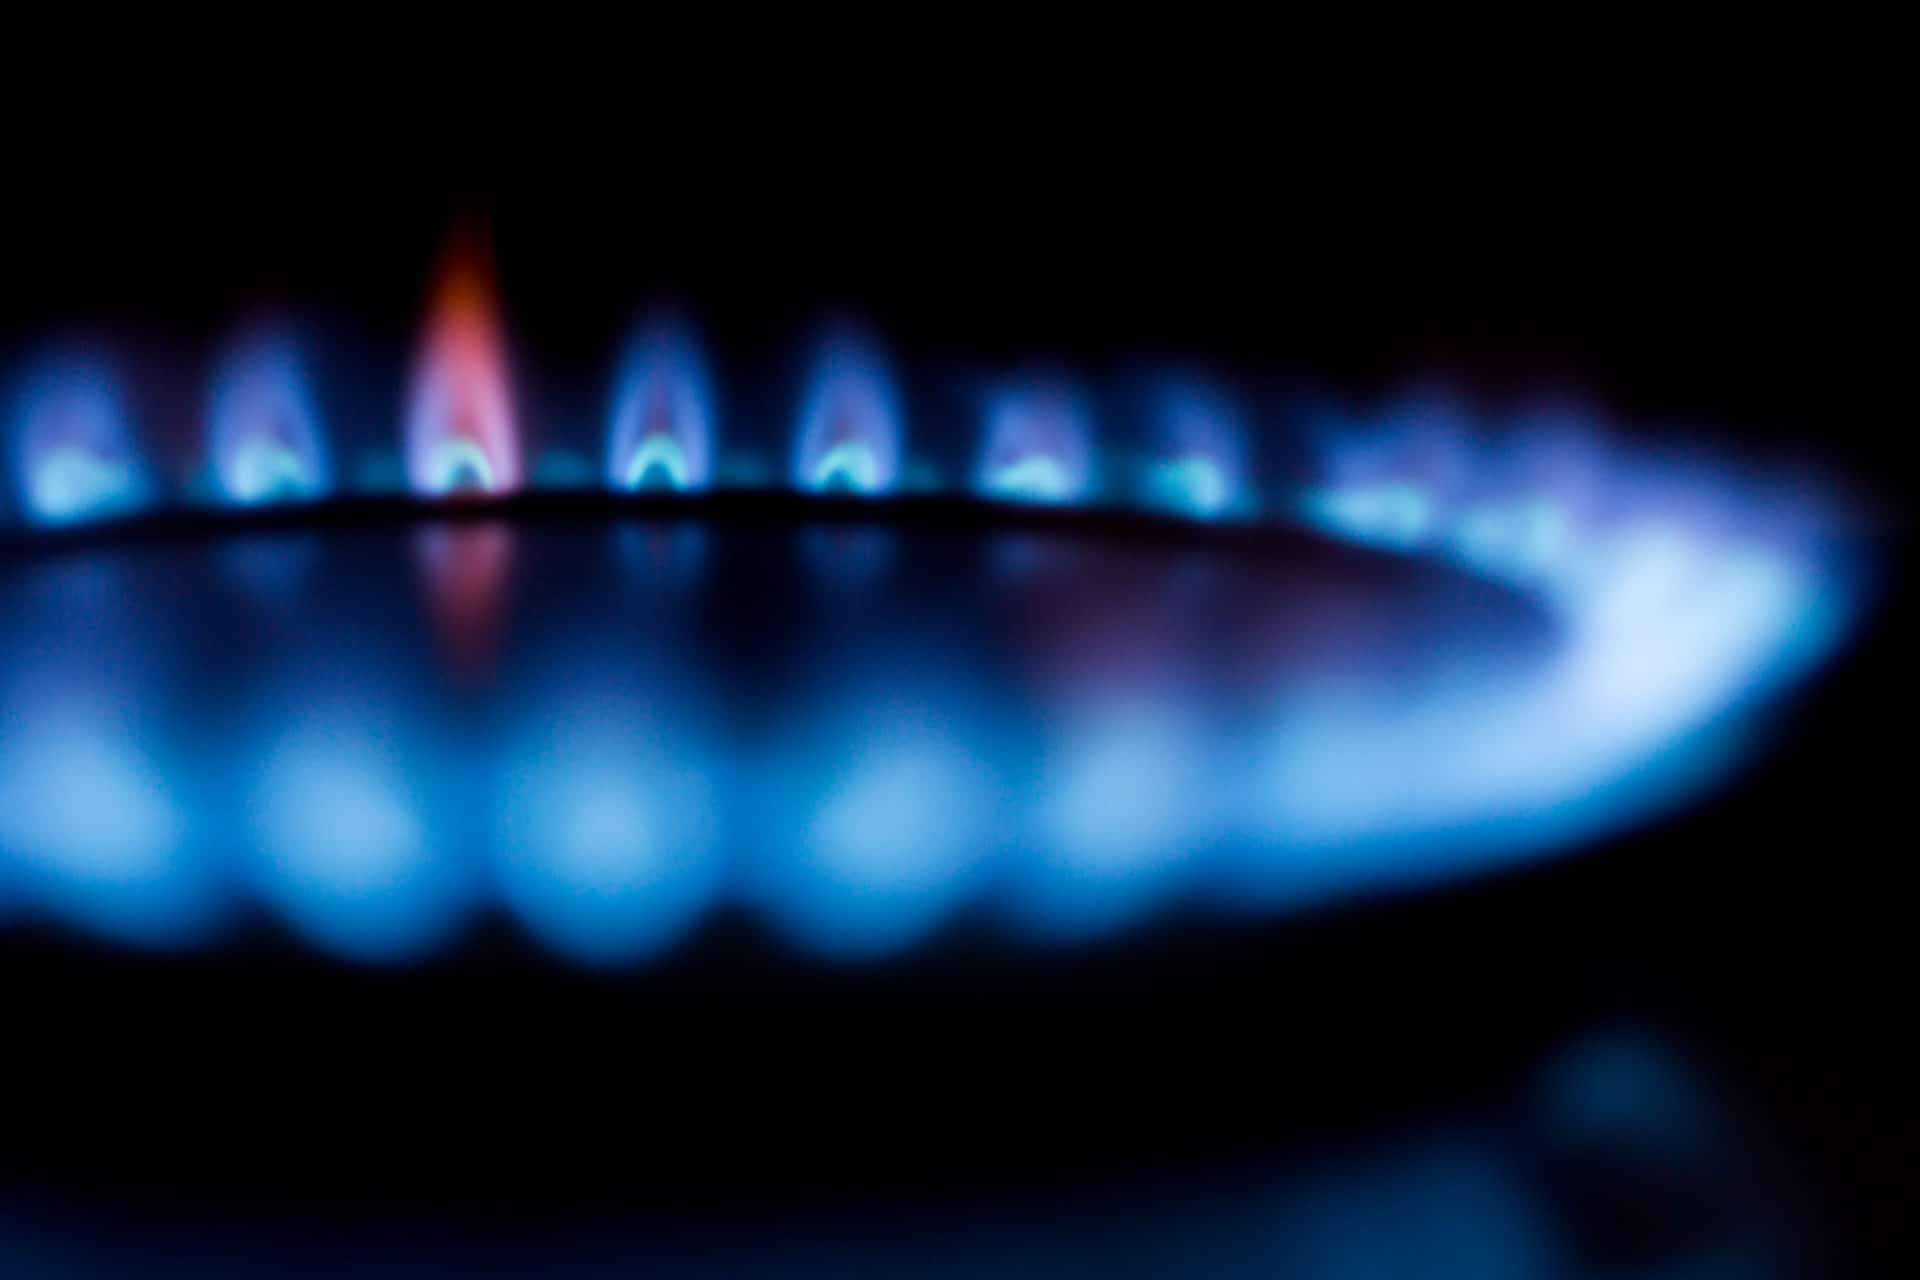 bruleur propane flame bleu